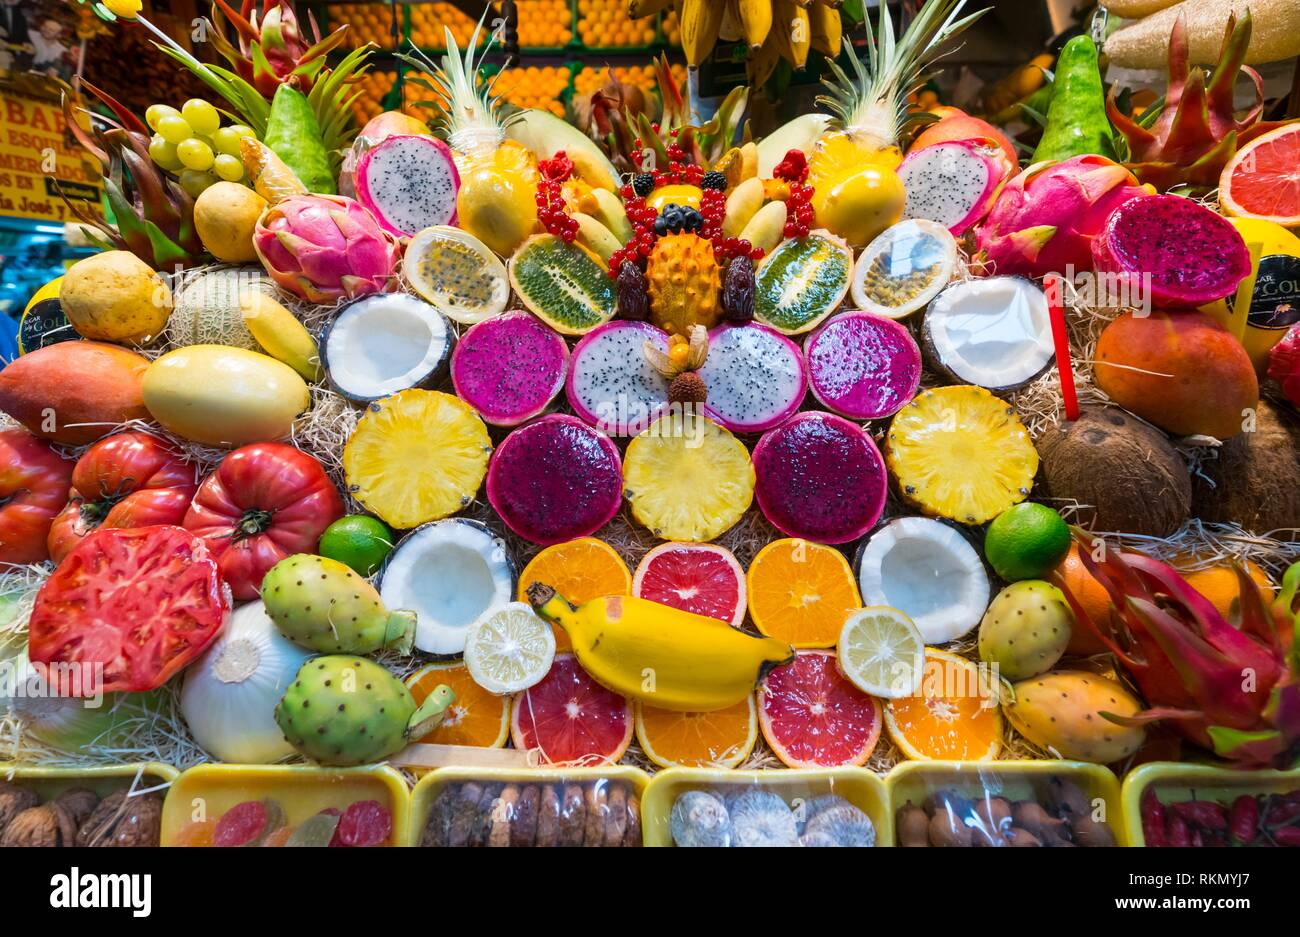 Bunte Früchte. Vegueta Markt, Vegueta Nachbarschaft, Las Palmas, Gran Canaria, Kanarische Inseln, Spanien, Europa. Stockbild